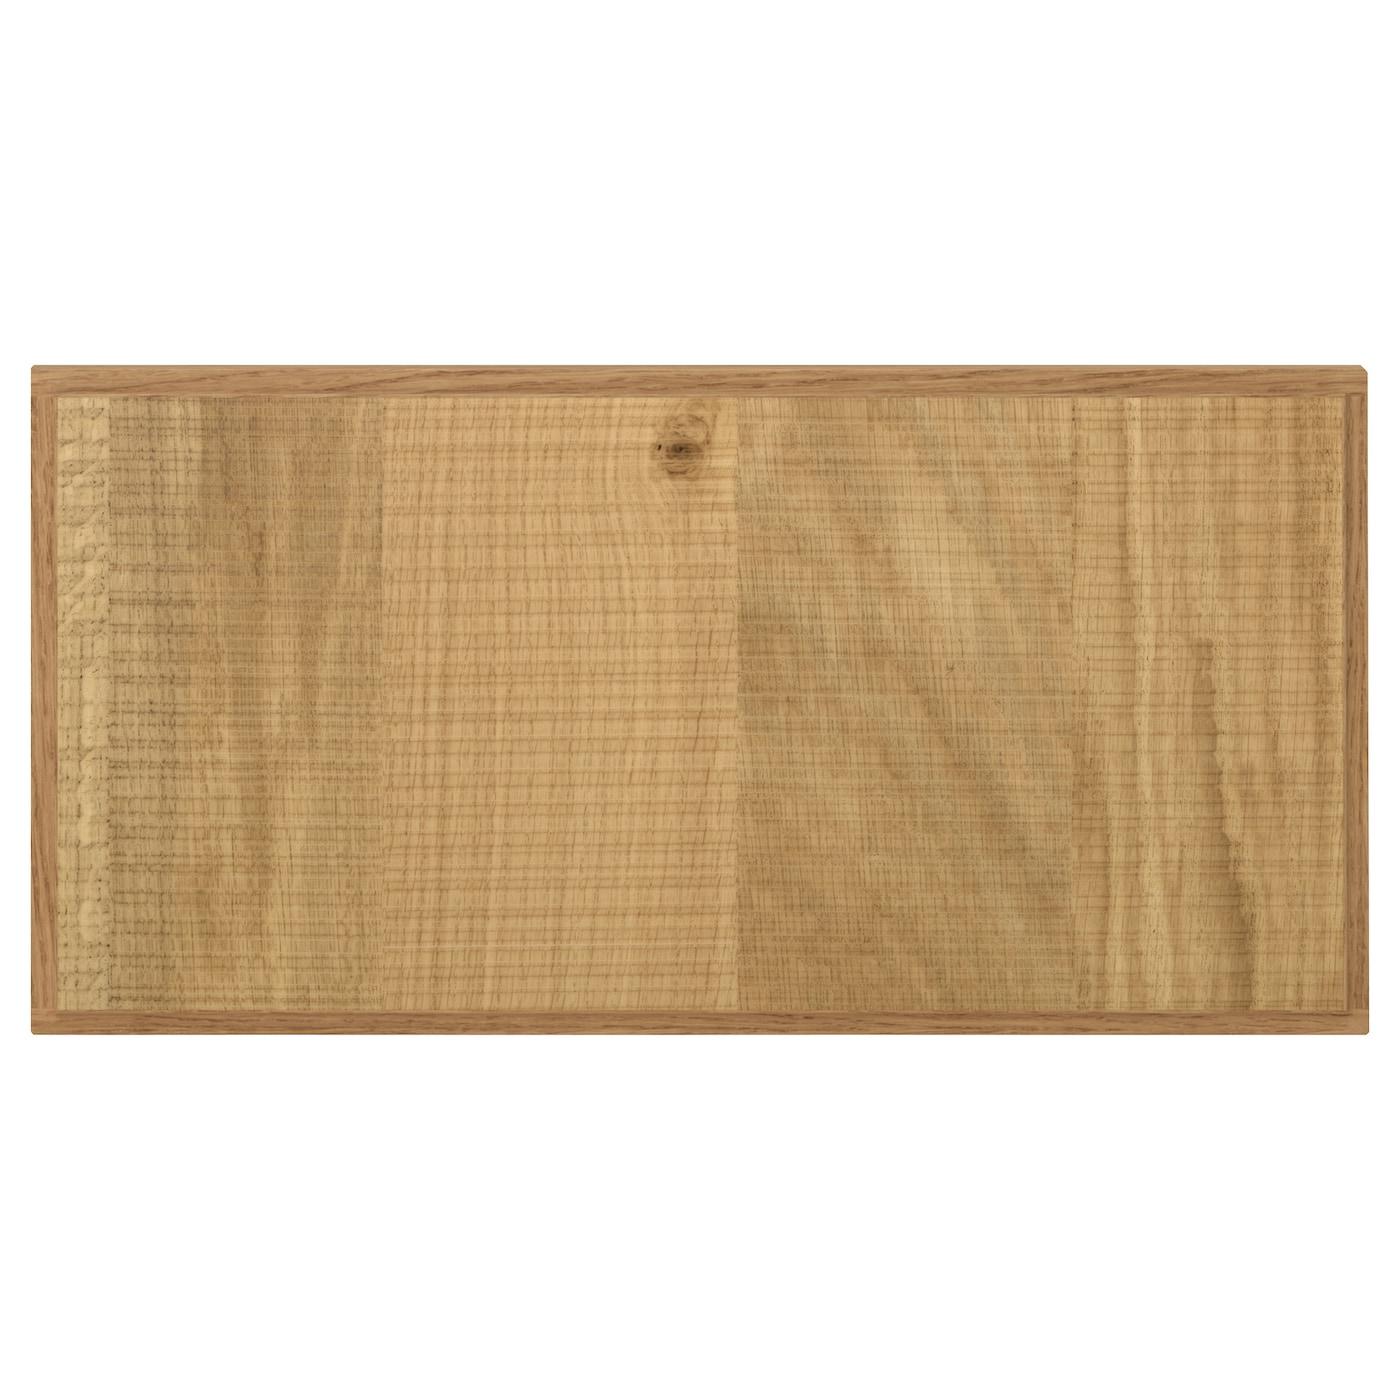 Kitchen Drawer Fronts Hyttan Drawer Front Oak Veneer 40X20 Cm  Ikea